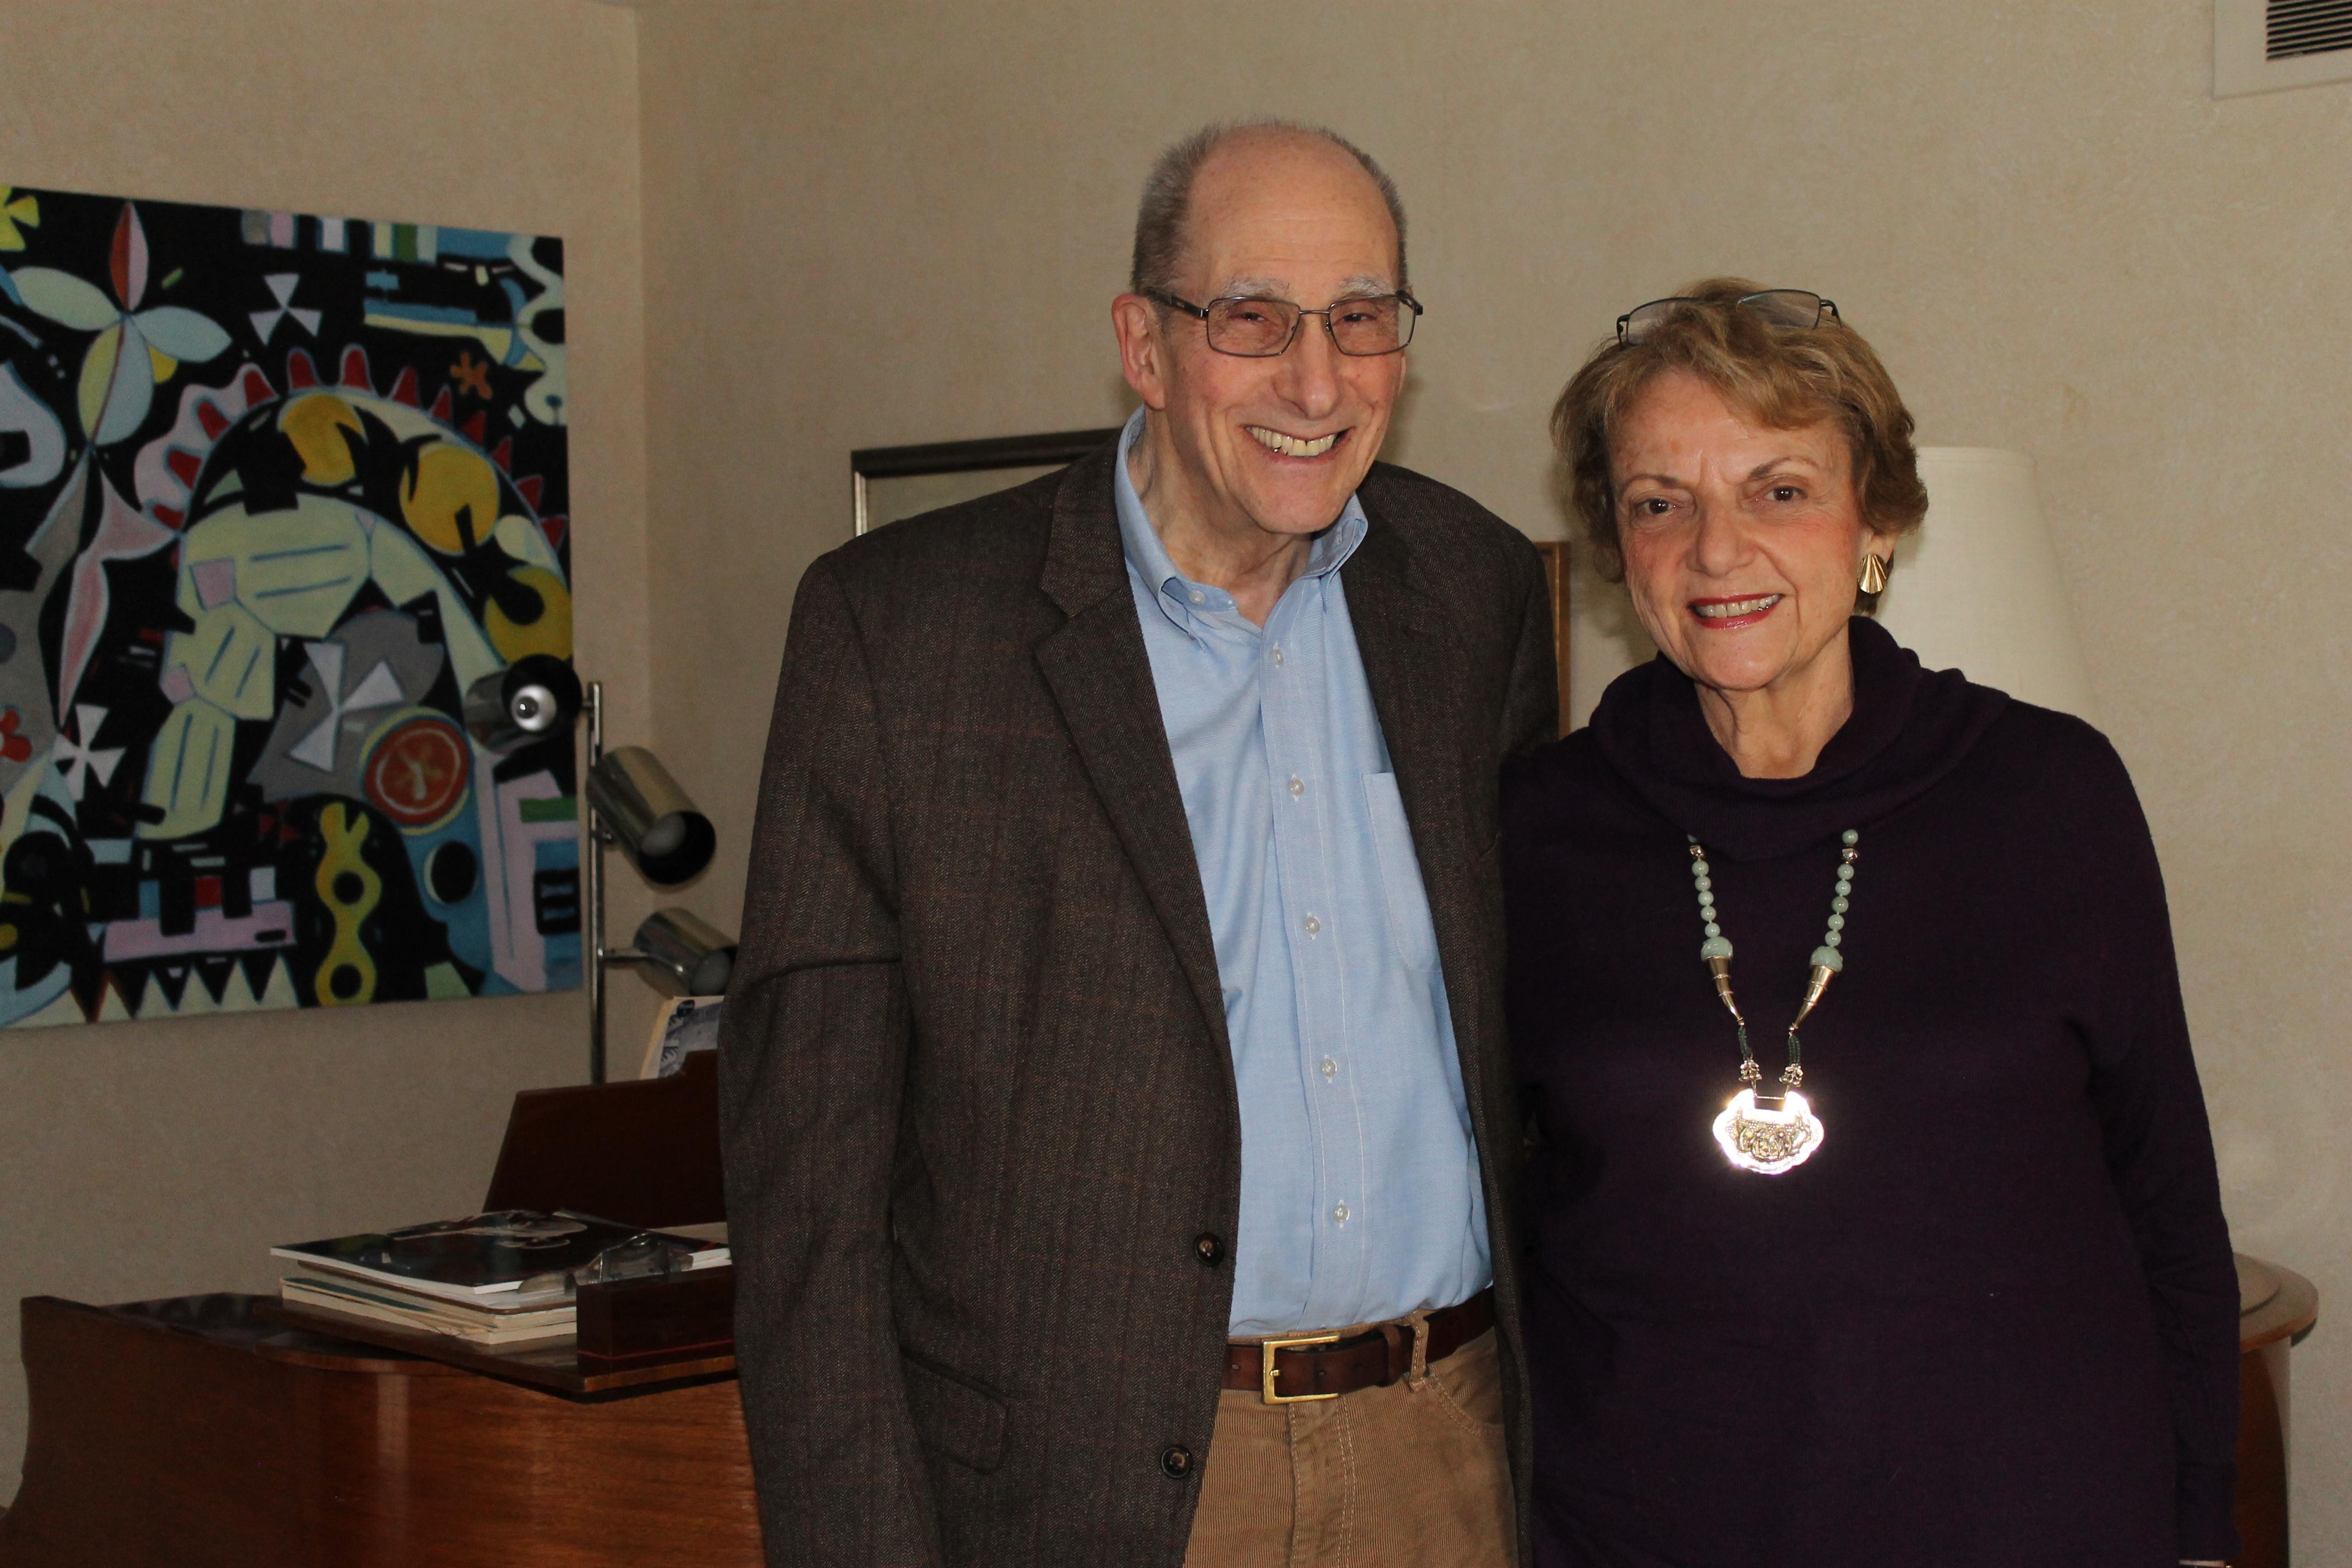 Alumni philanthropists - Dr. Edward and Mrs. Barbara Klarman create future Pivotal Moments